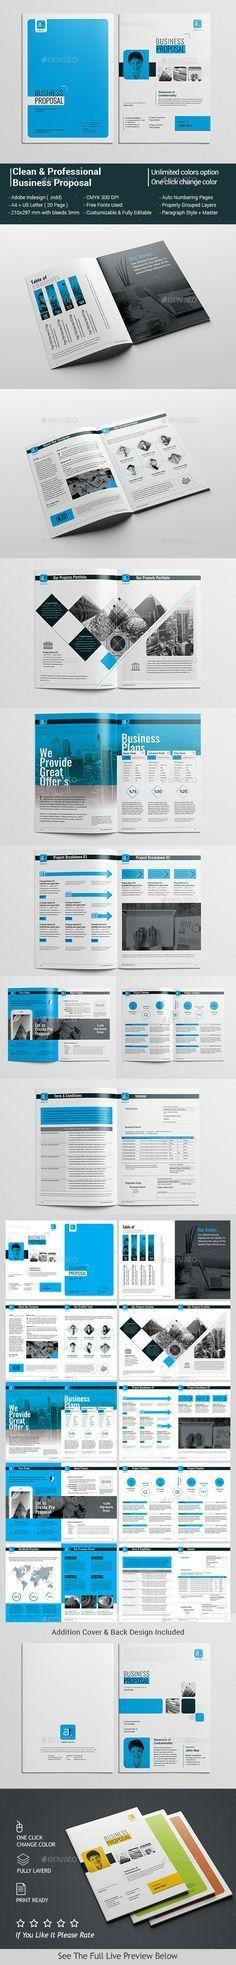 Sports Team Sponsorship Proposal | Indesign templates, Proposals ...